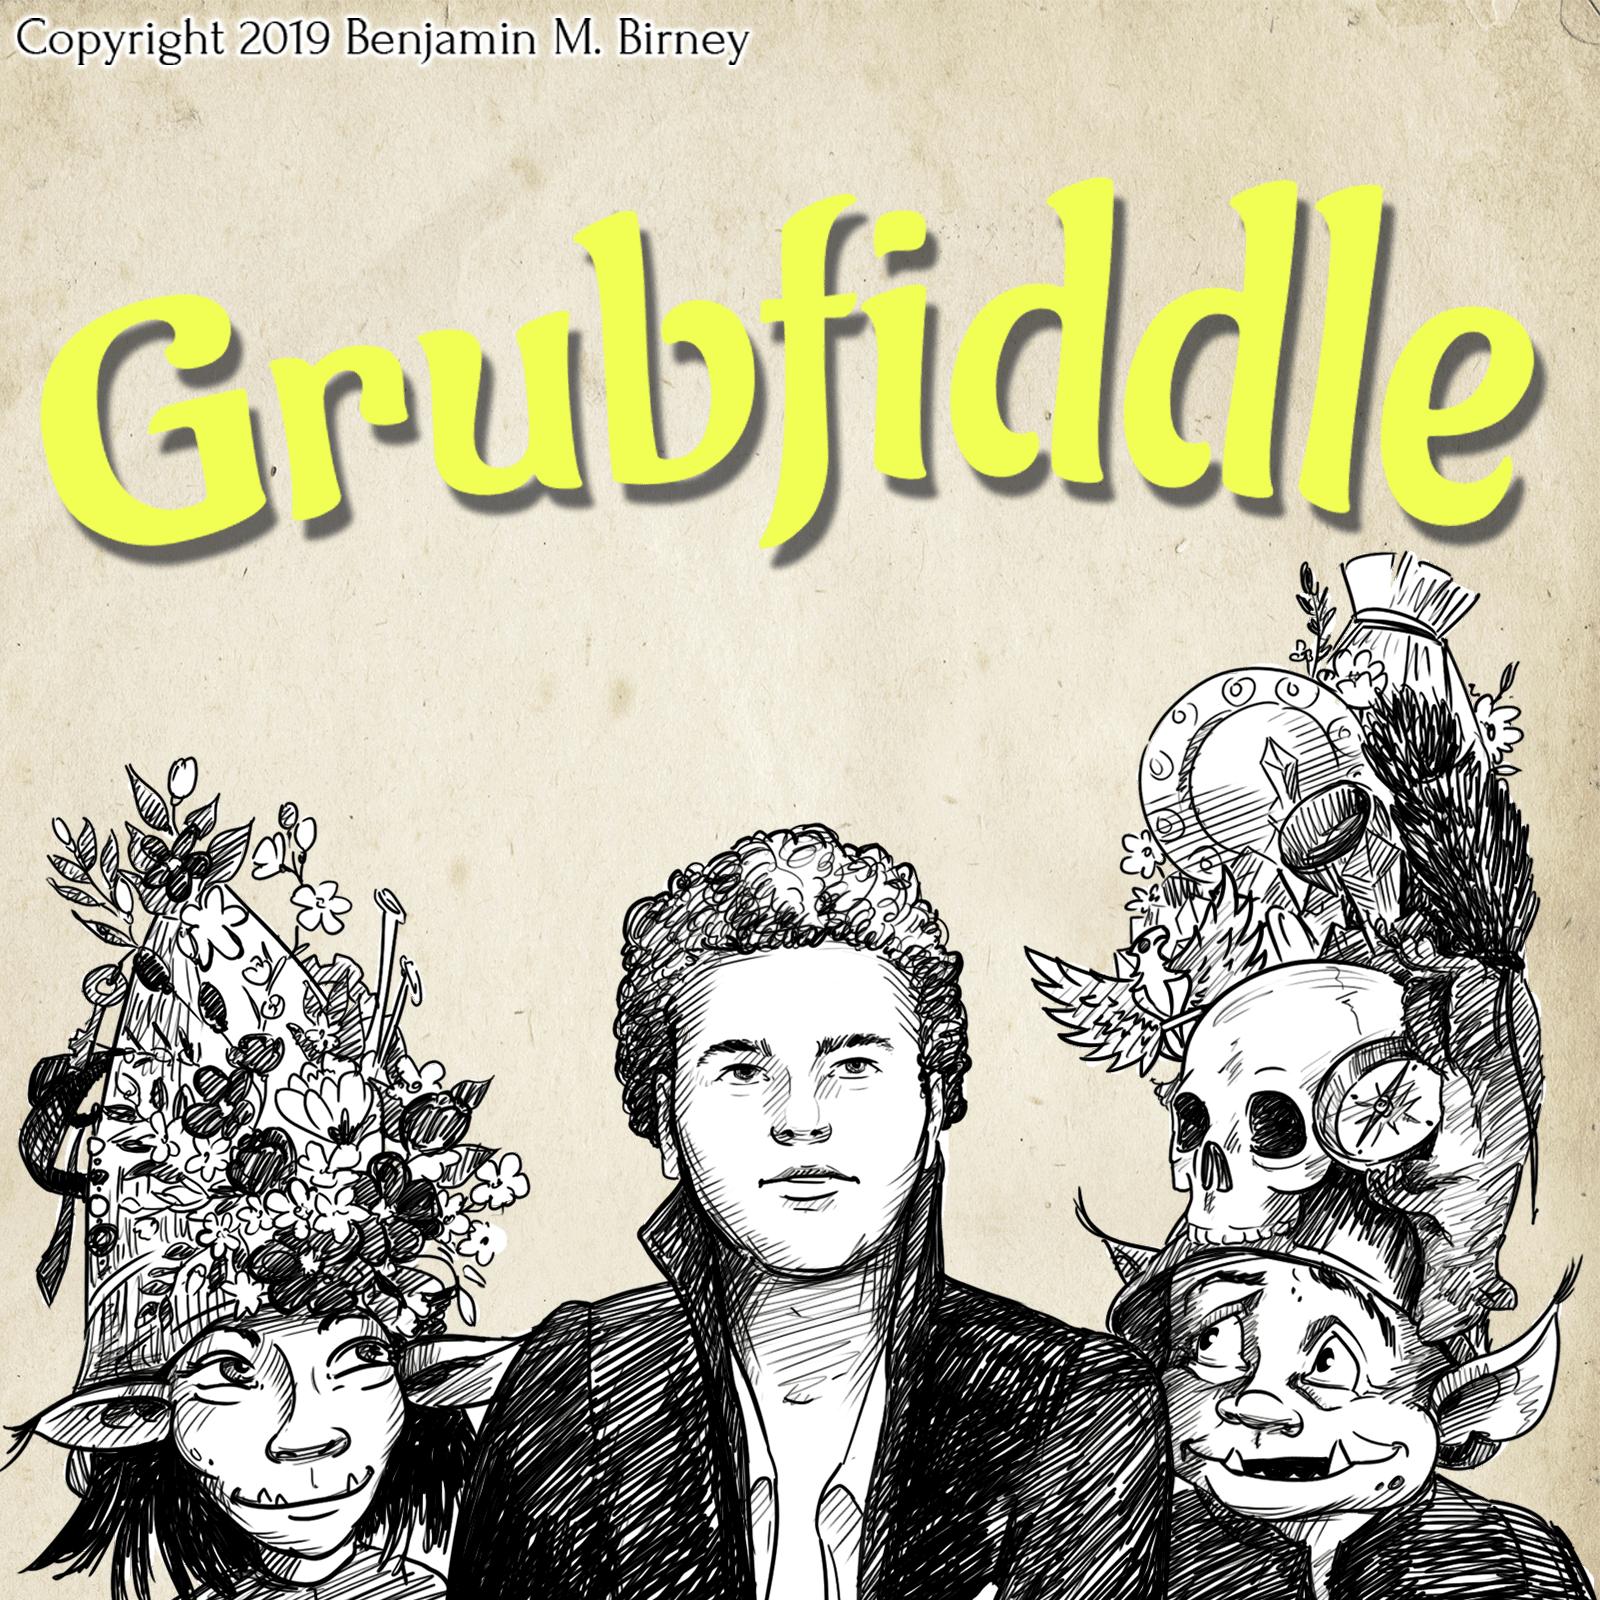 GRUBFIDDLE